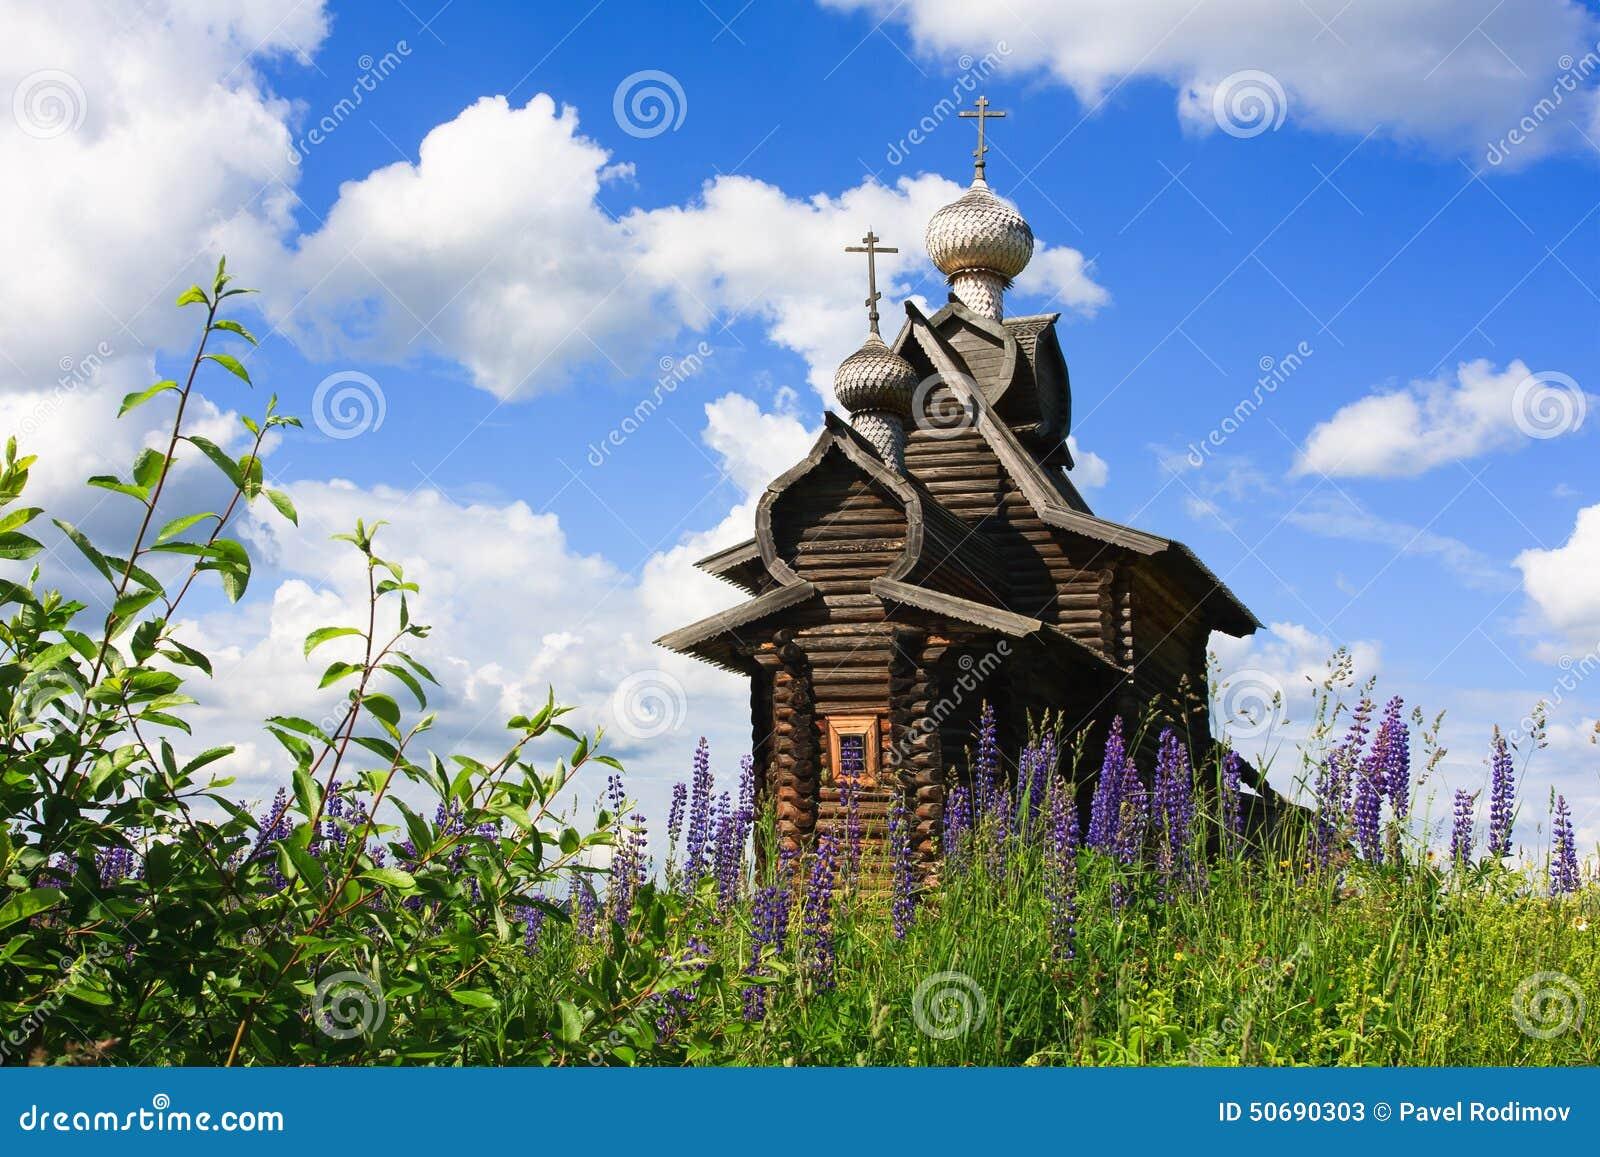 Download 变貌古老木教会 编辑类库存照片. 图片 包括有 beautifuler, 布哈拉, 博物馆, 云彩, 顽皮地 - 50690303